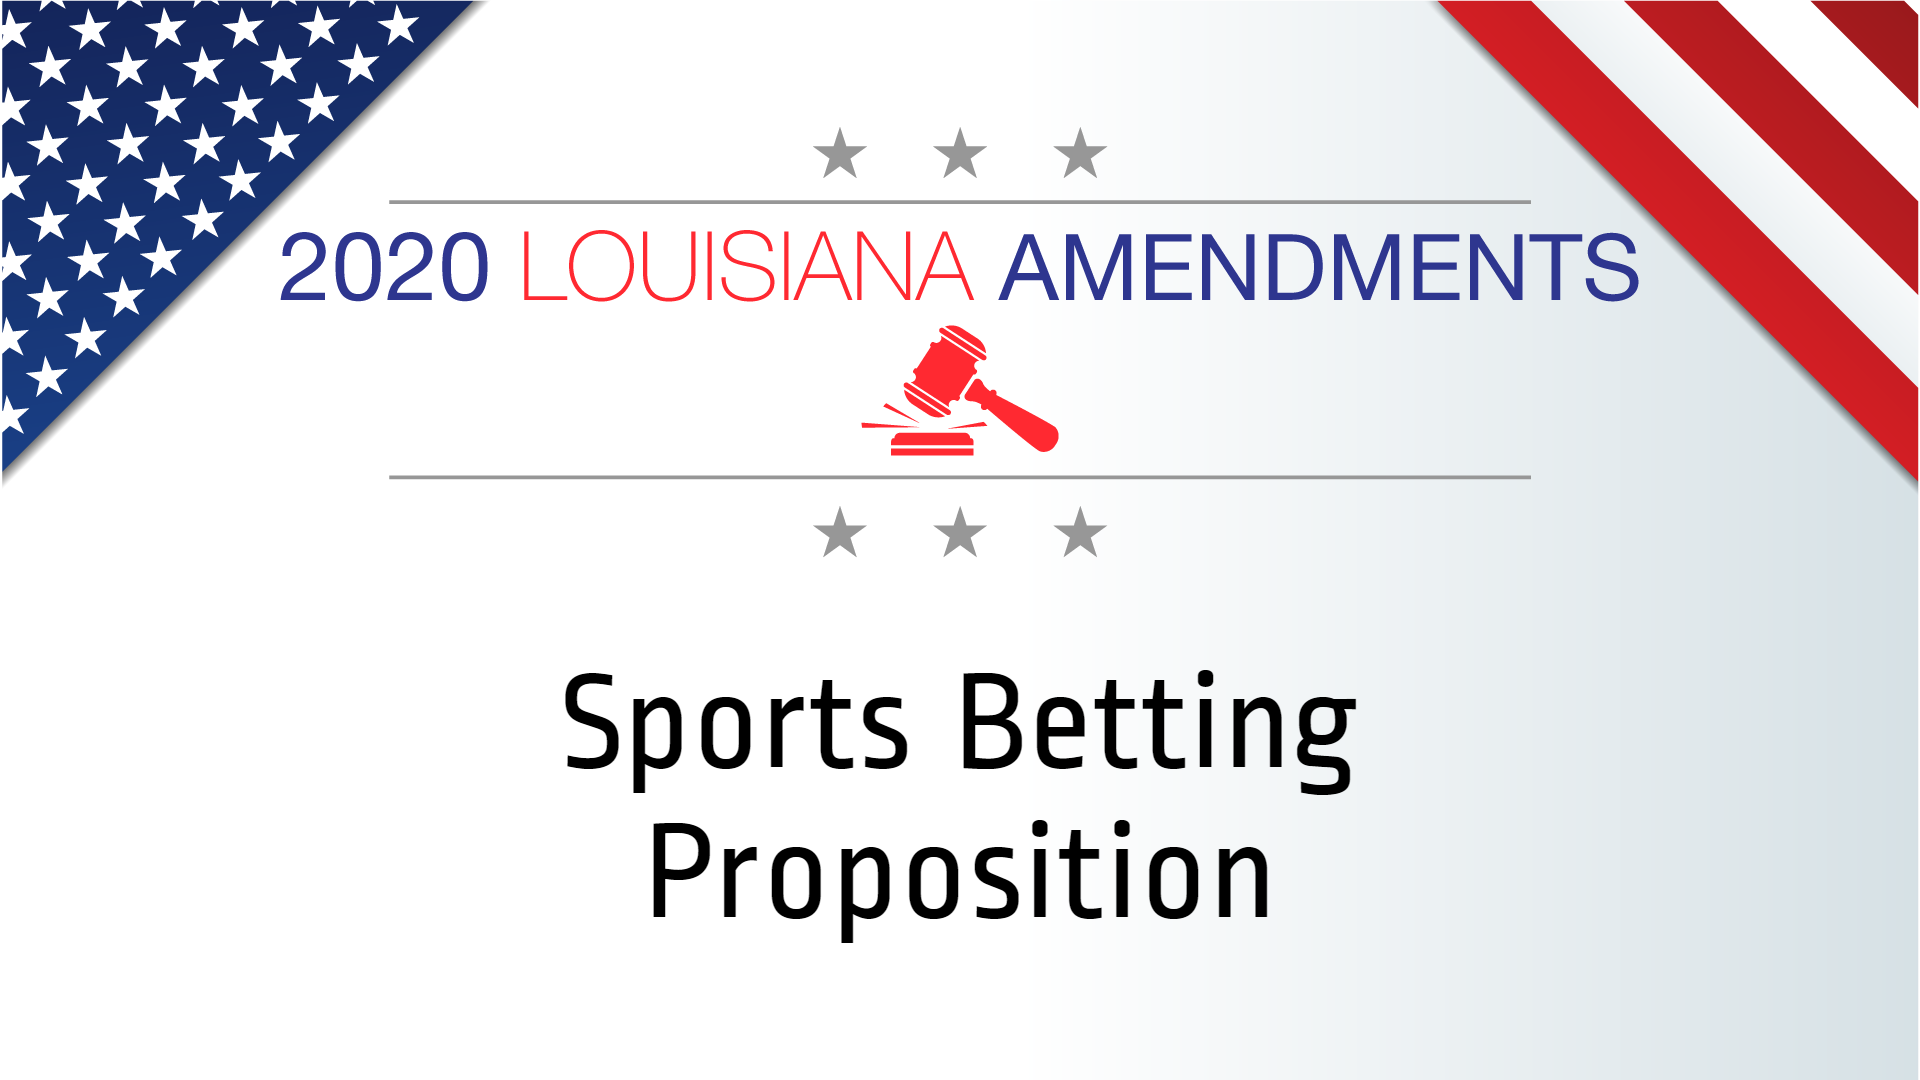 should louisiana legalize sports betting